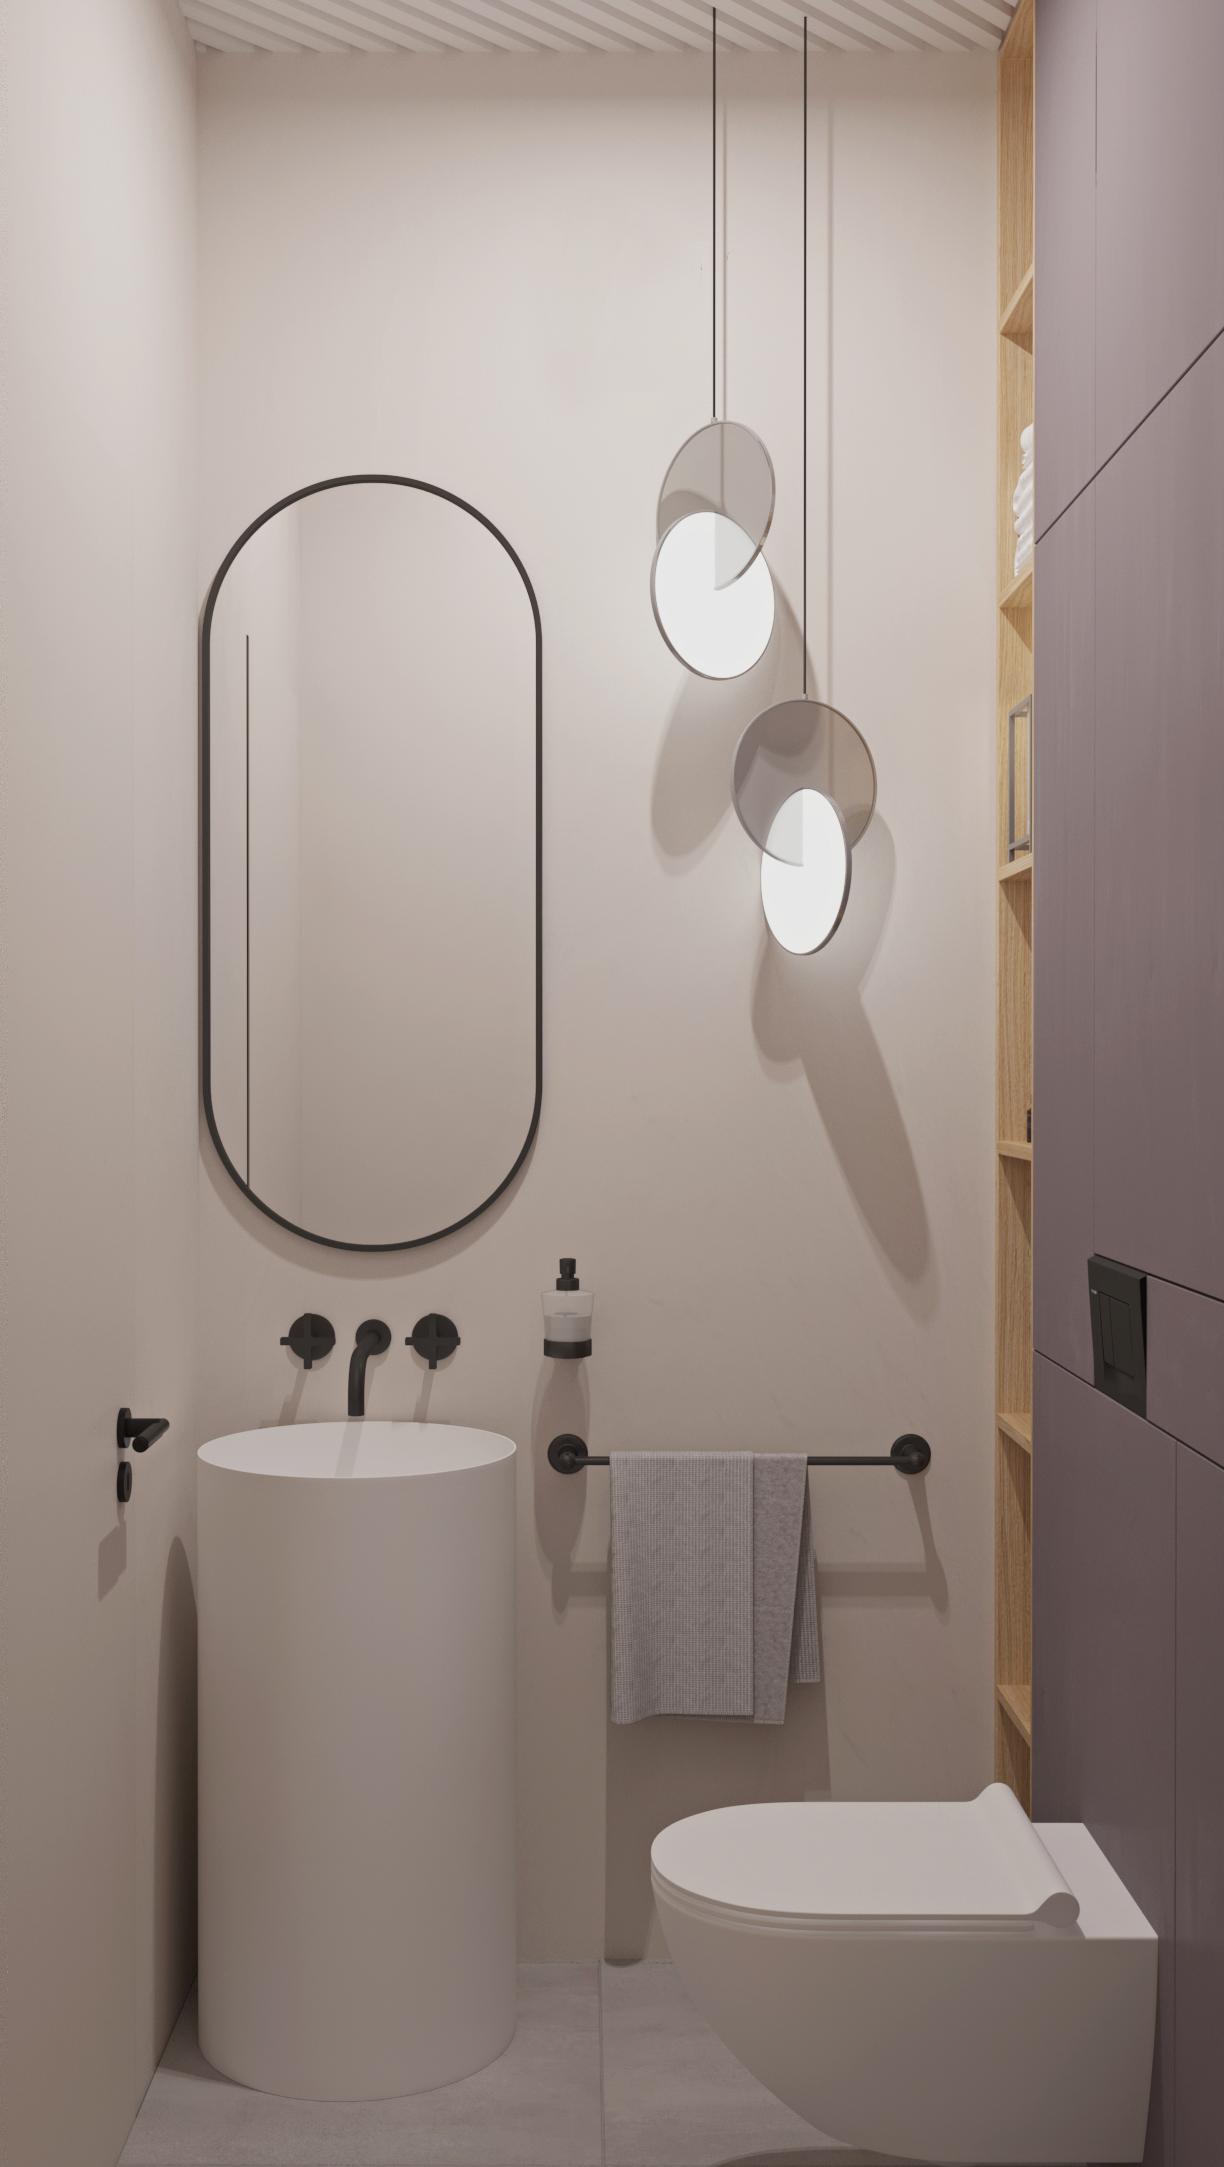 1_guest_bathroom